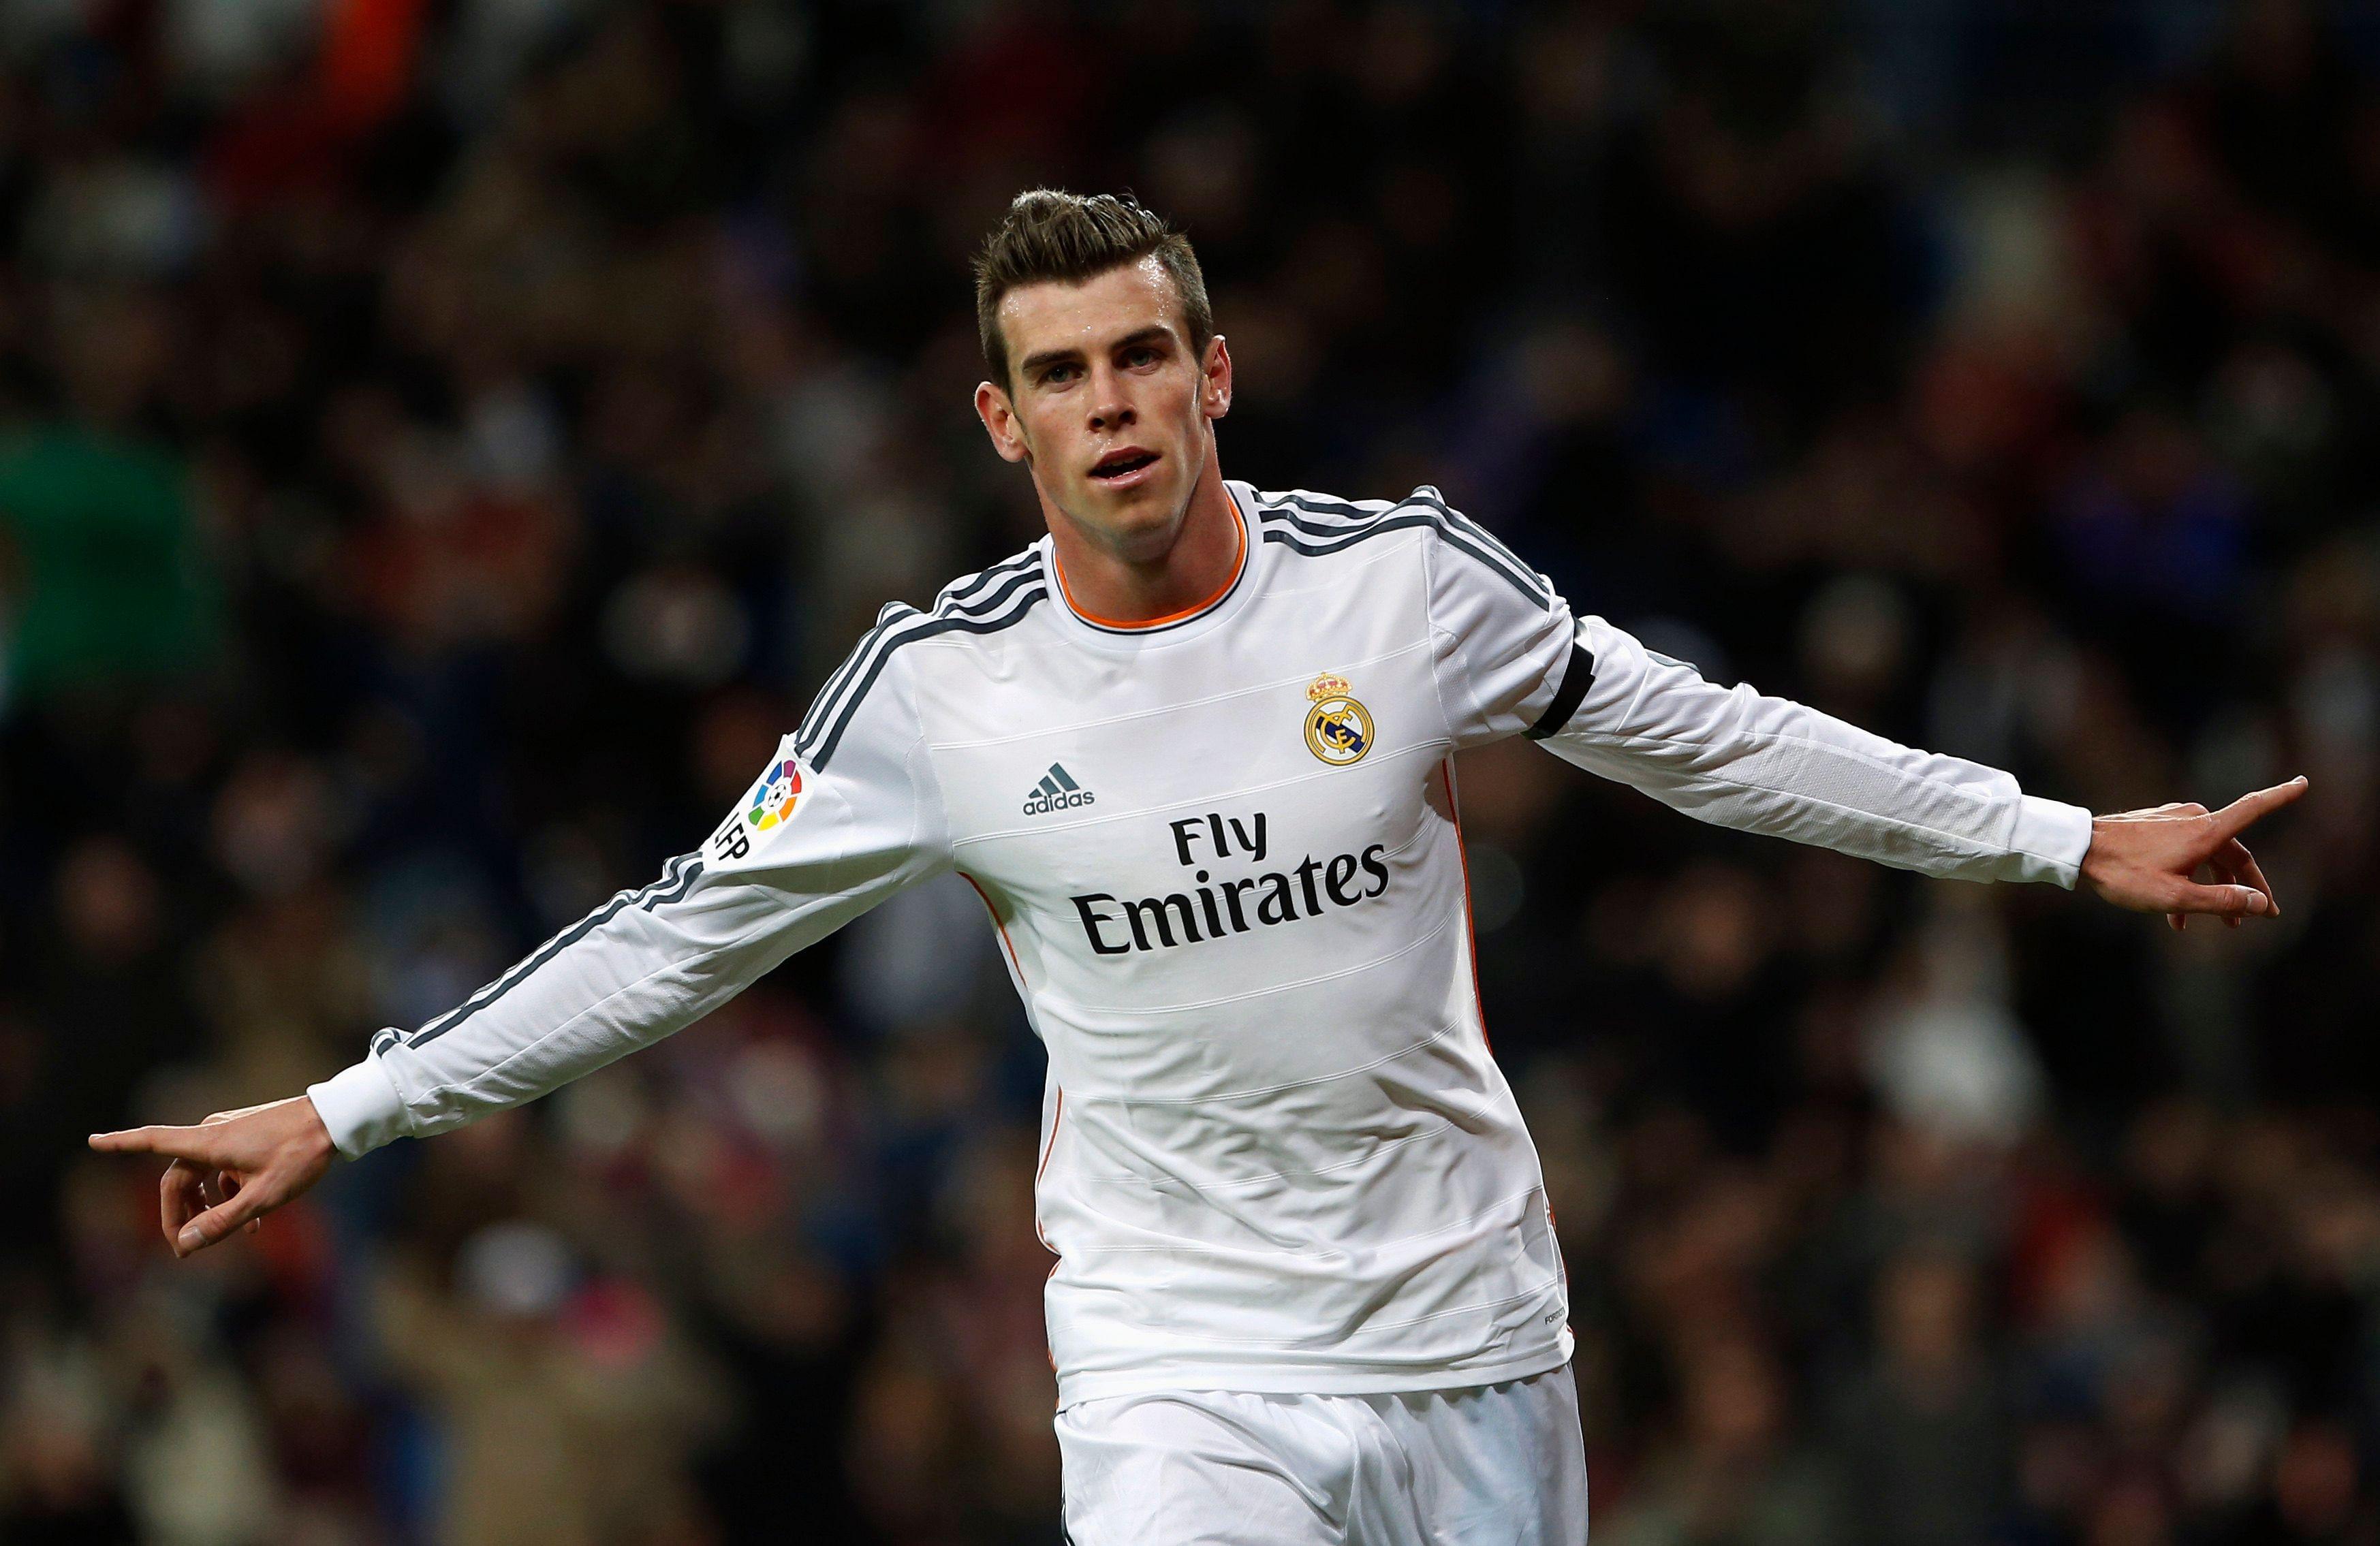 Noticias del Real Madrid | Real Madrid CF